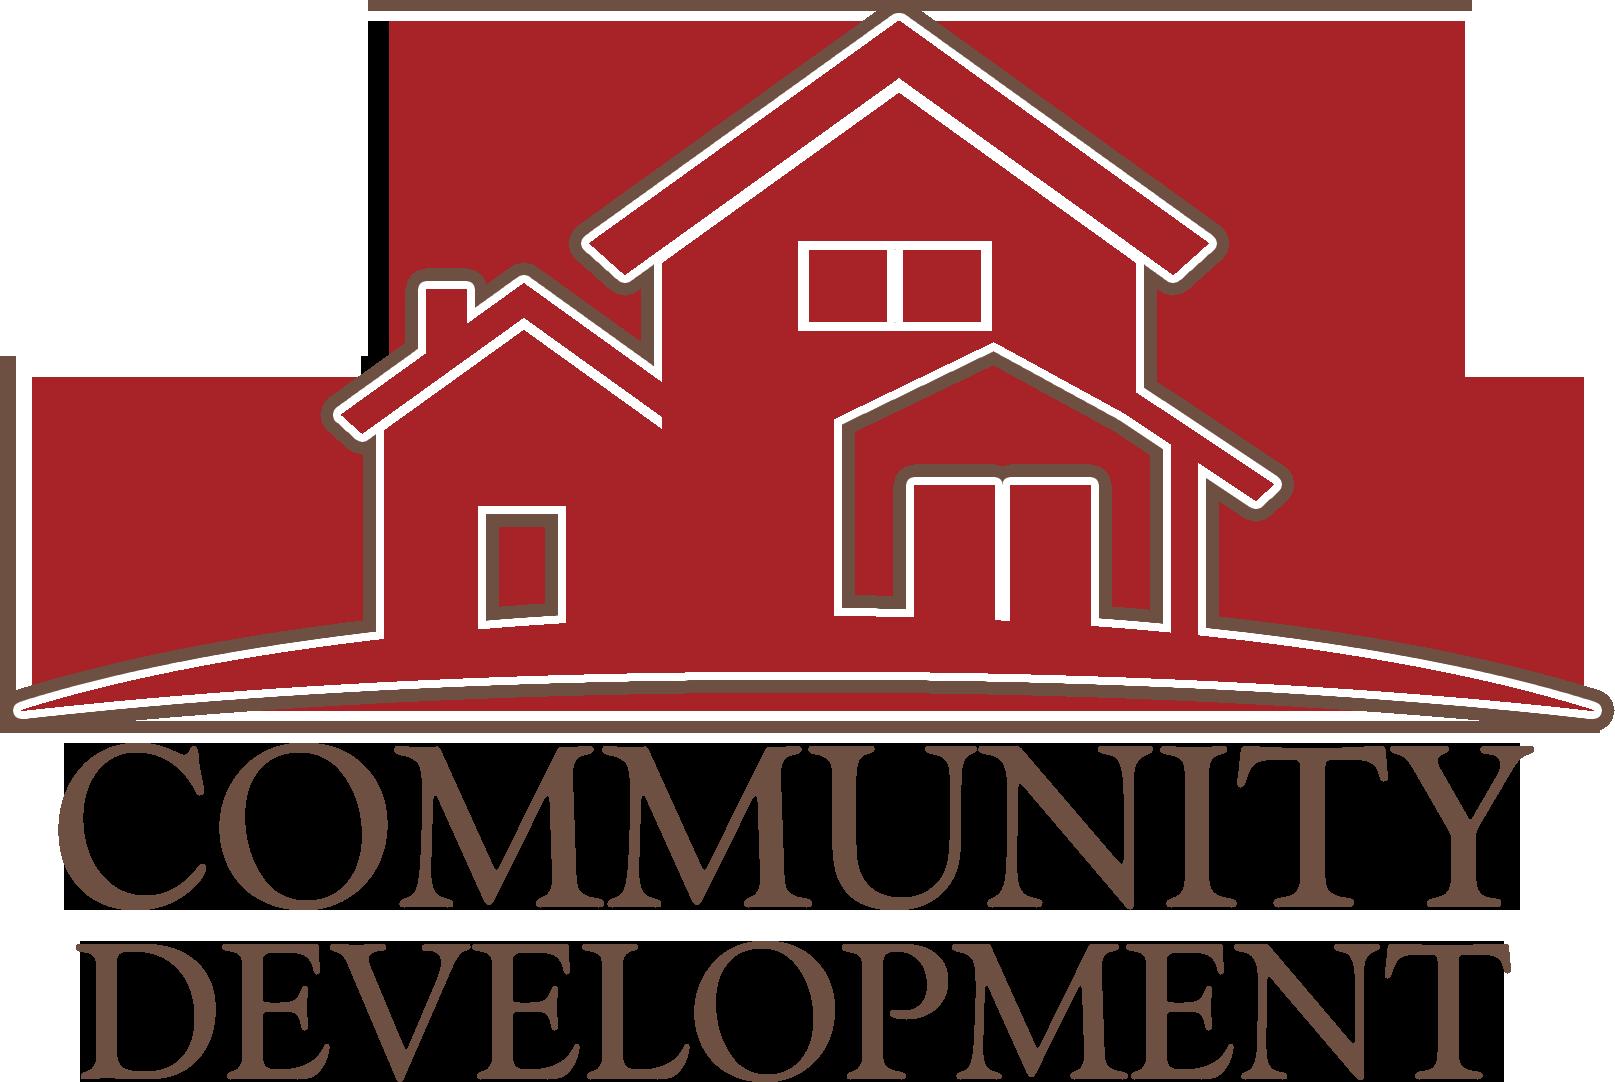 Community Development.